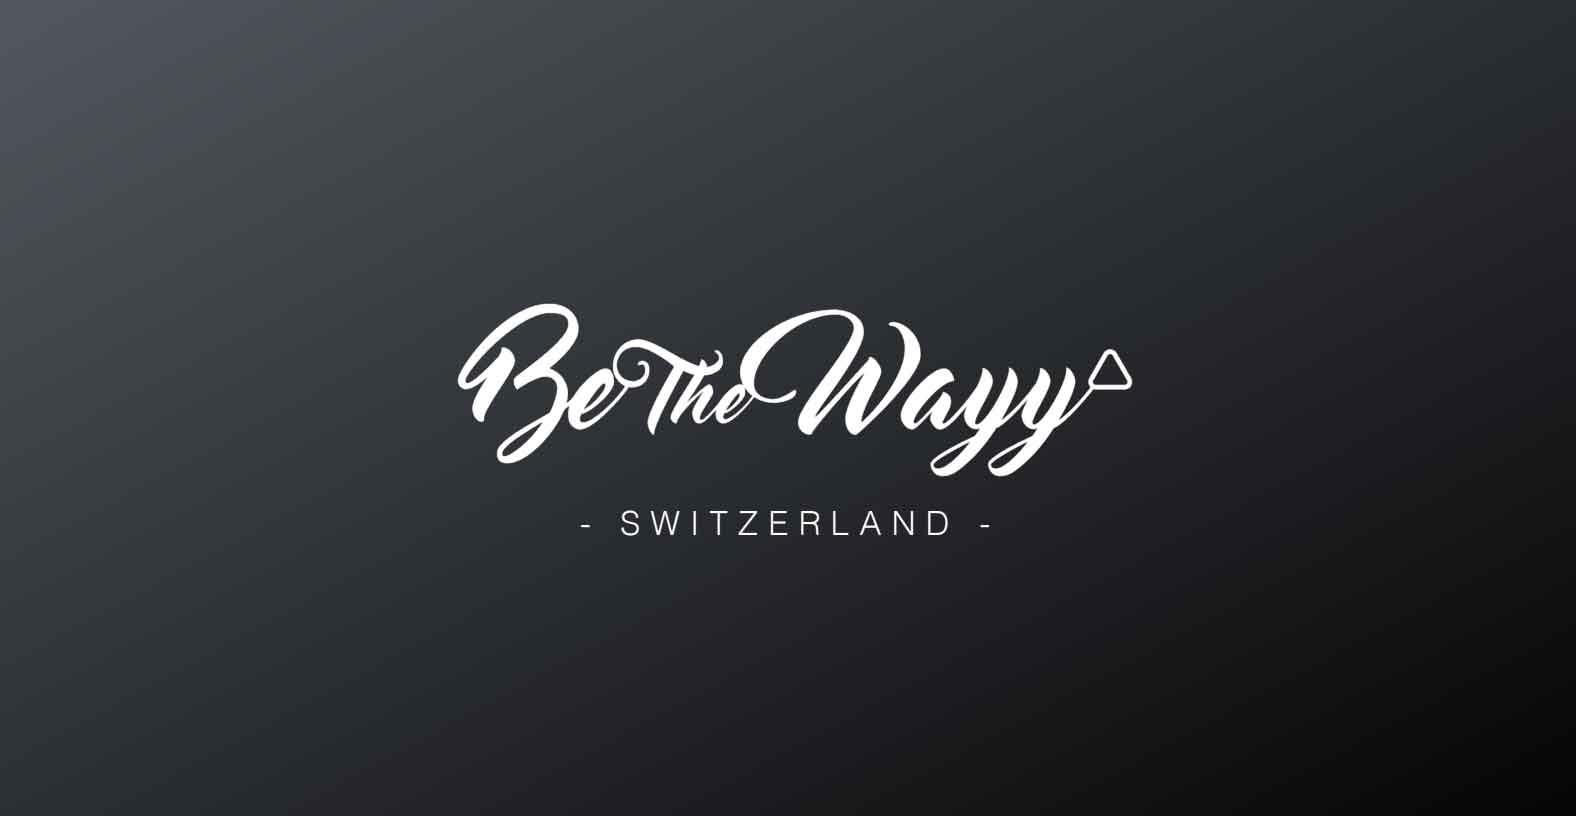 bethewayy_teeser